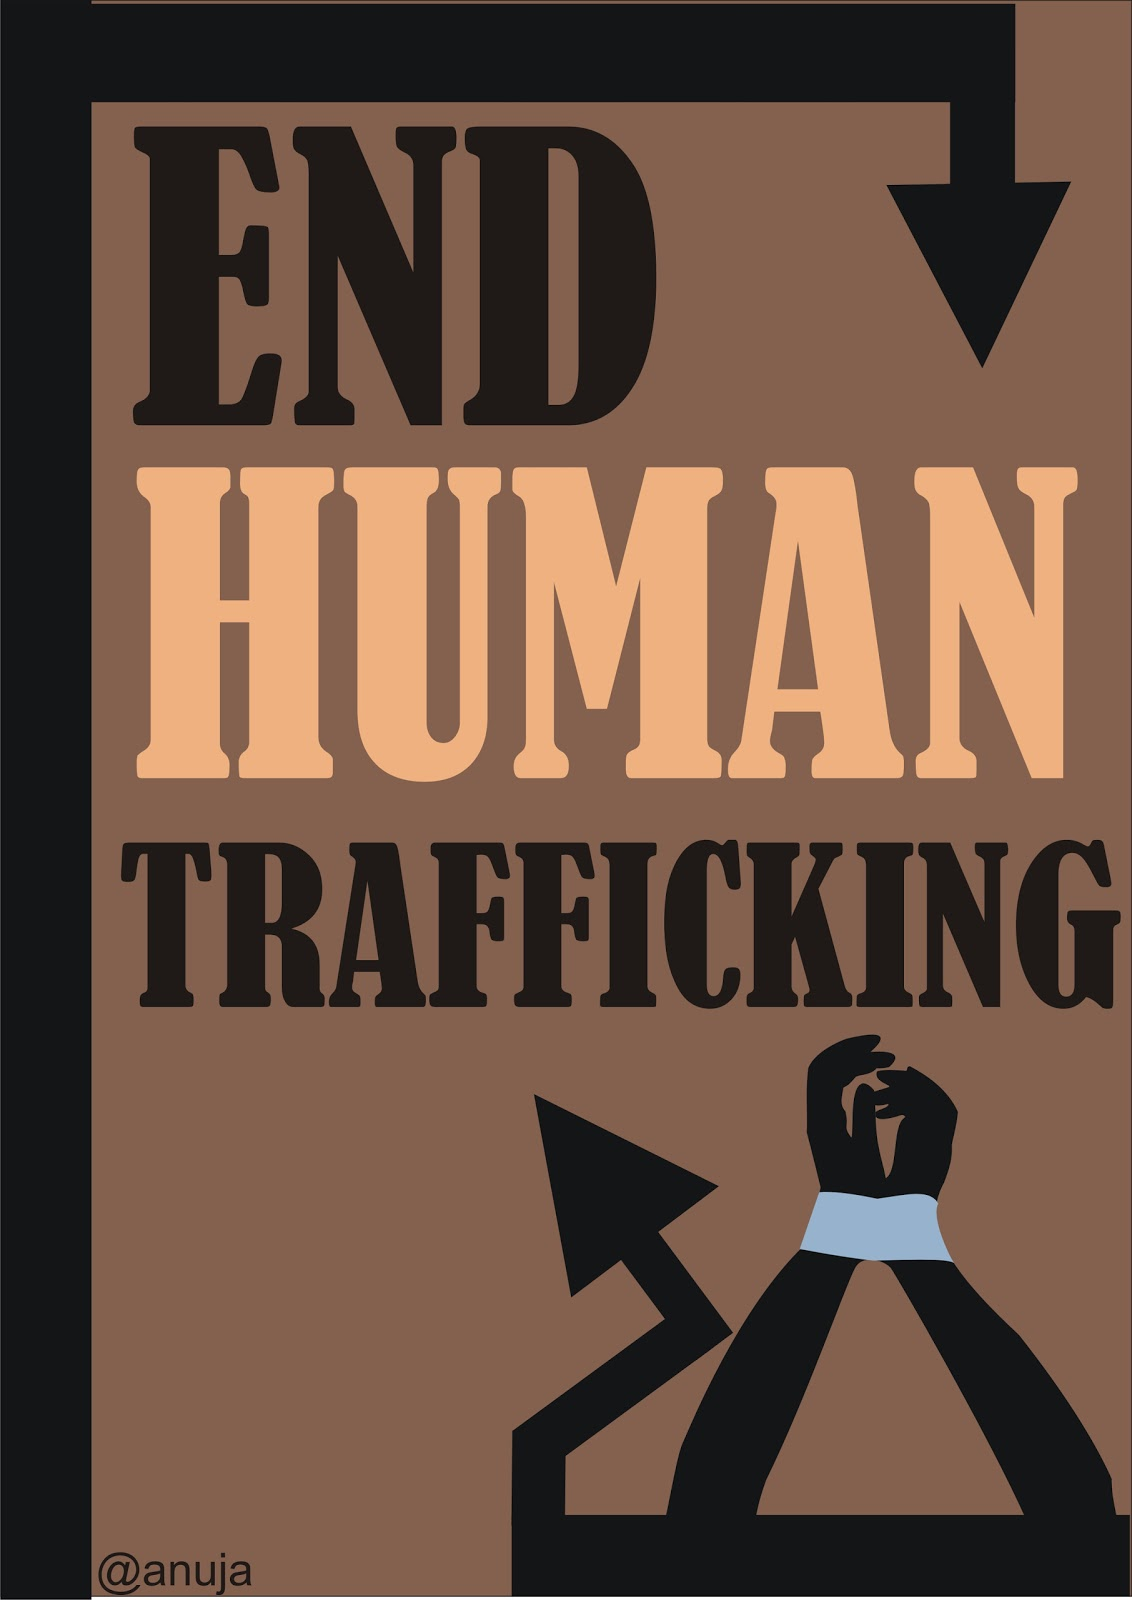 essay on human trafficking pro essay pro con essay gxart  human trafficking essay essays on human trafficking essays on human trafficking marbury v madisons wmestocard com